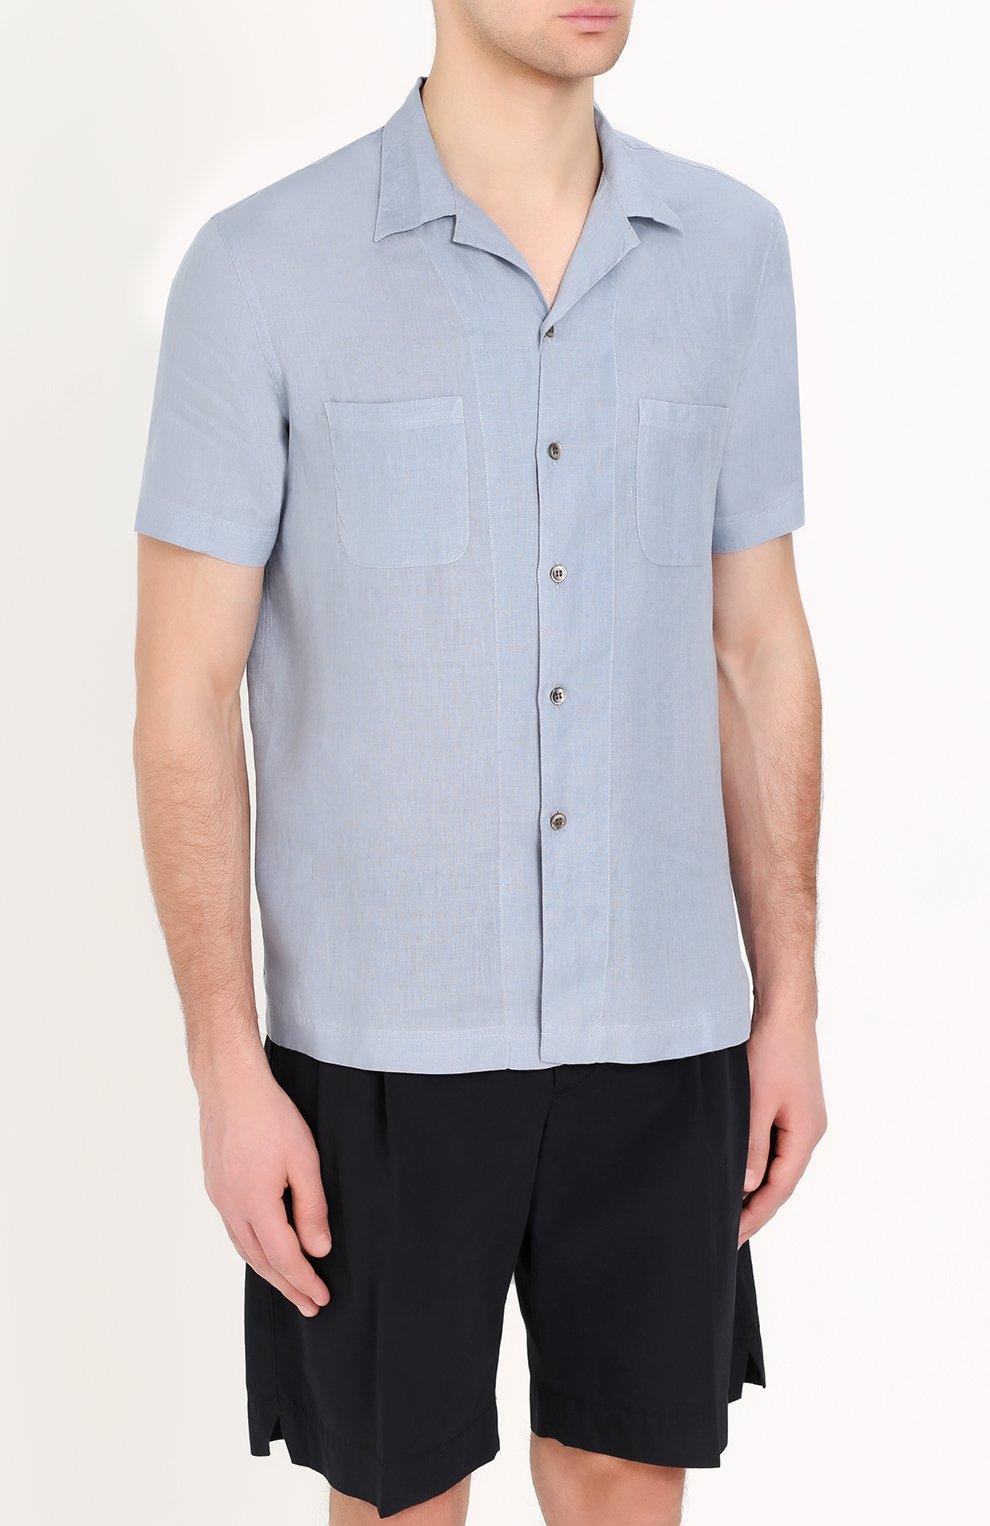 Льняная рубашка с короткими рукавами | Фото №3